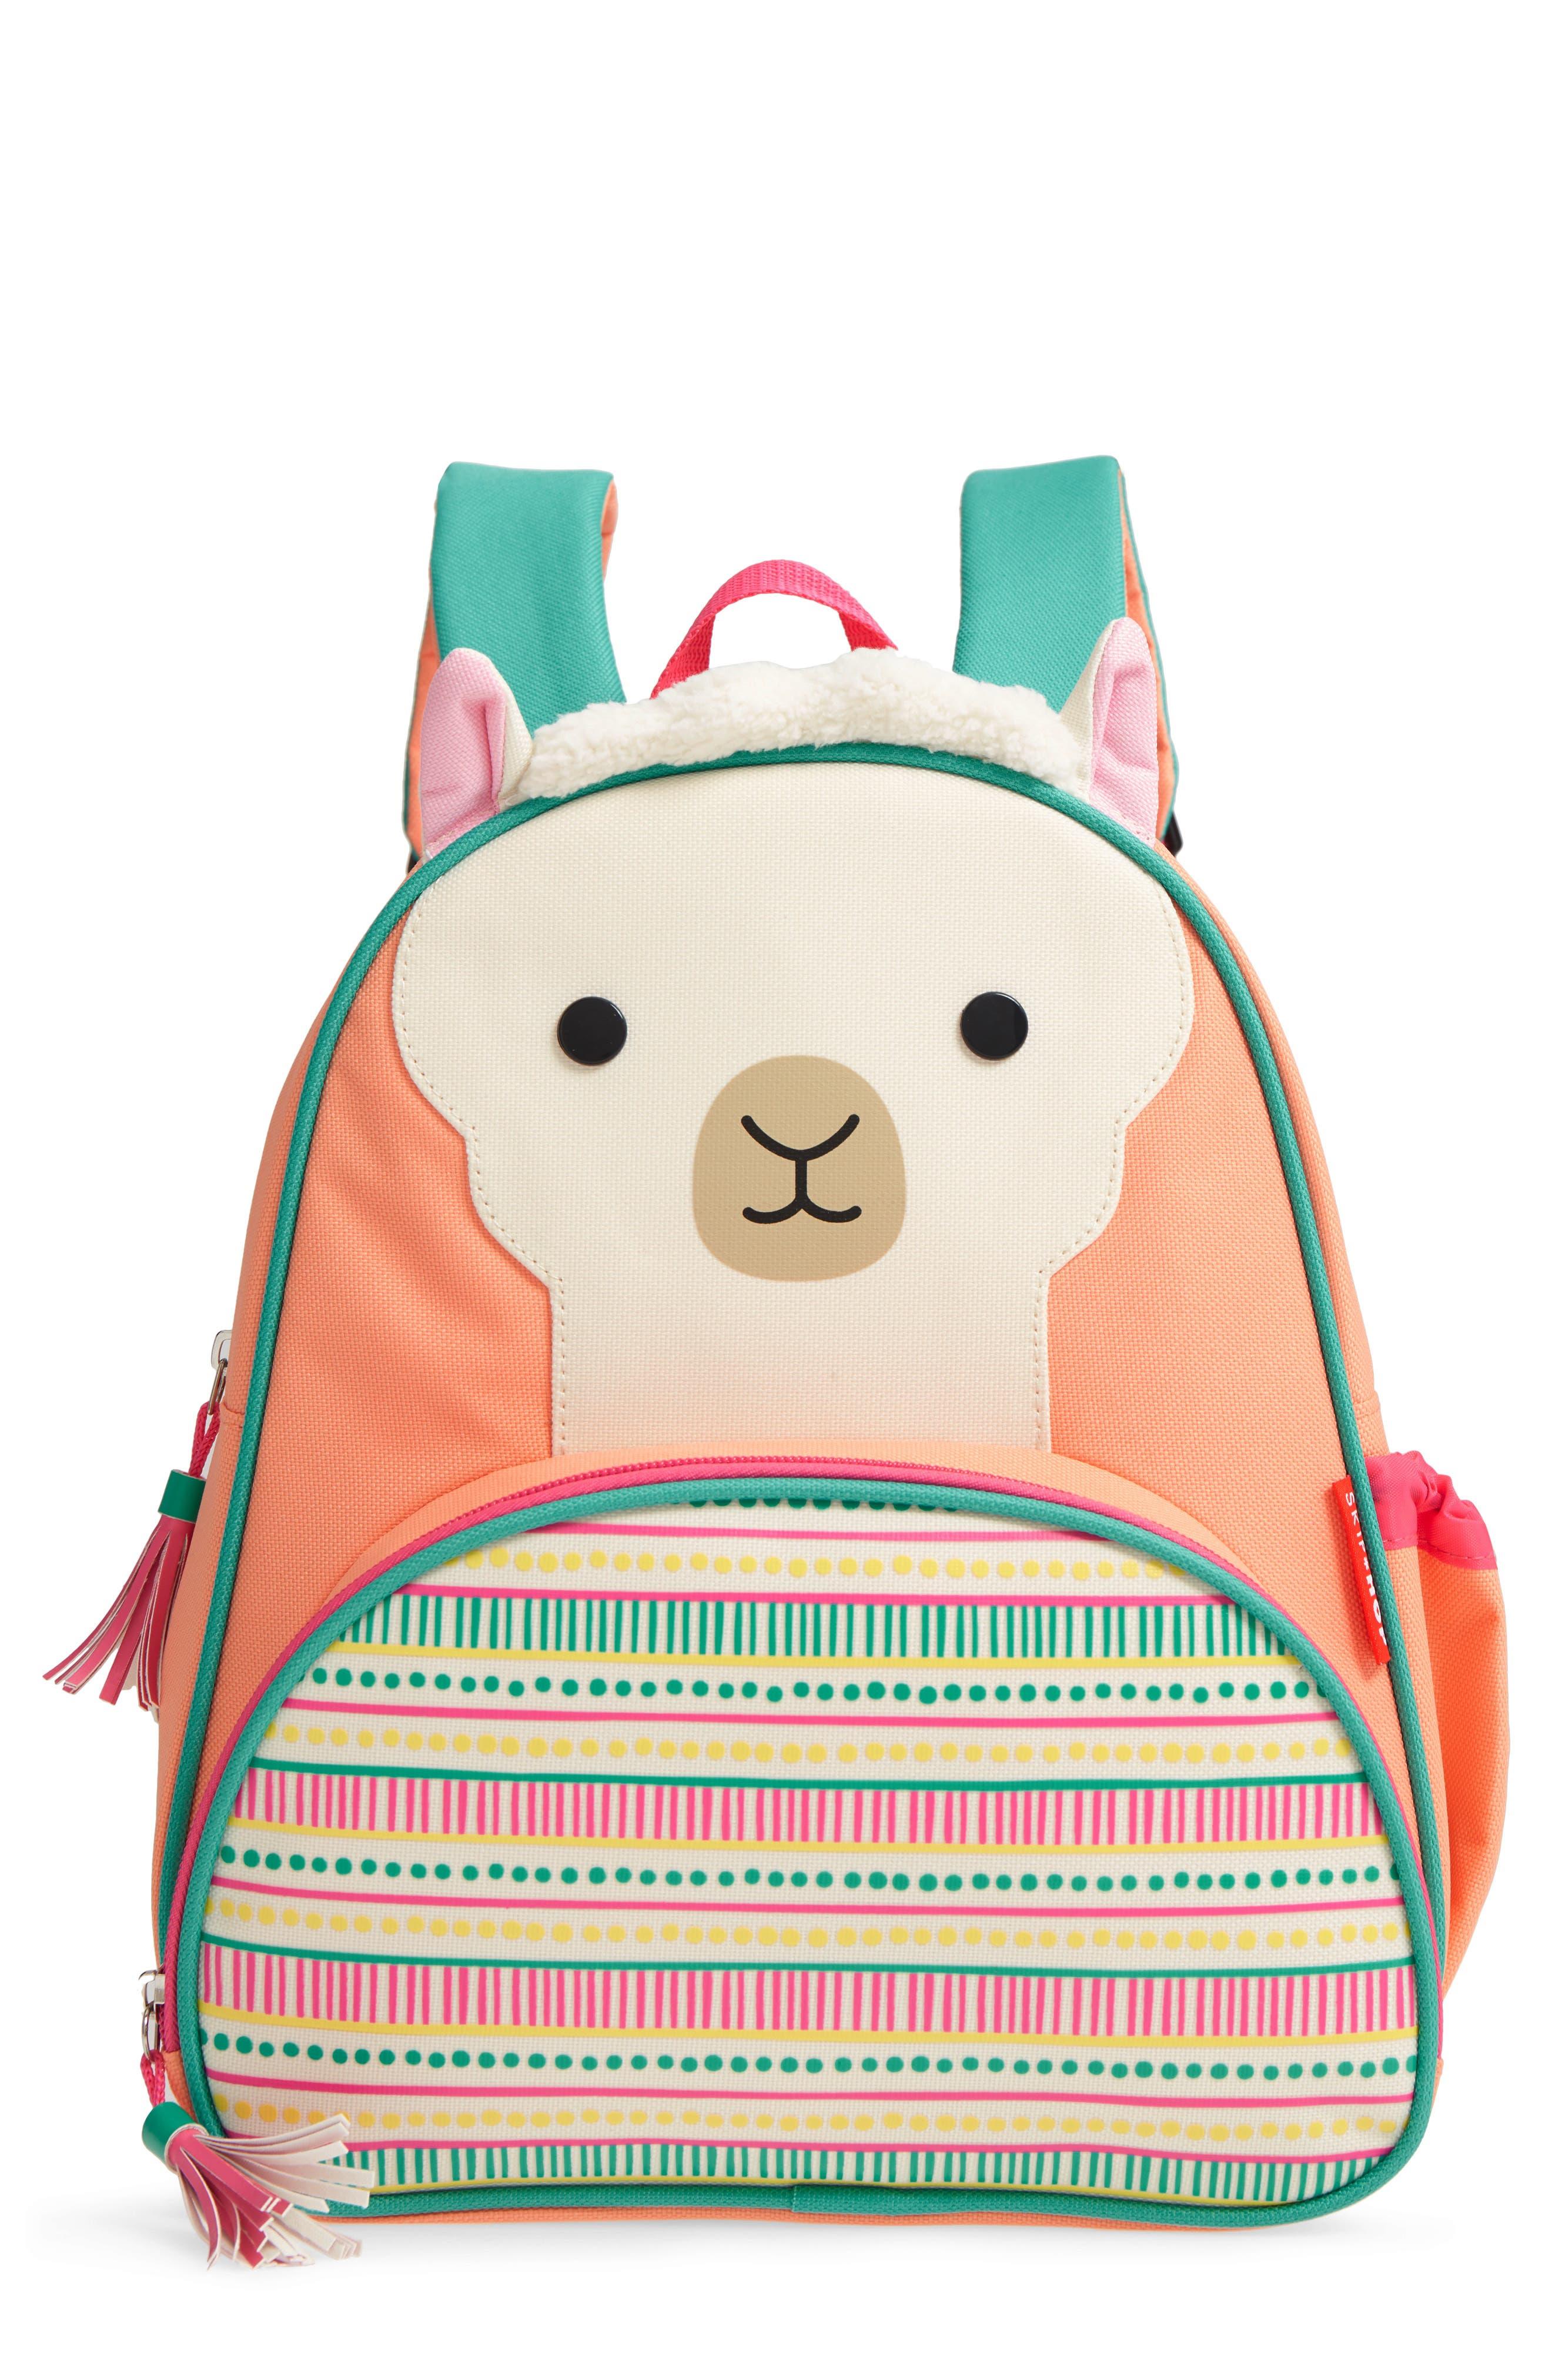 Zoo Pack Llama Backpack, Main, color, PINK MULTI